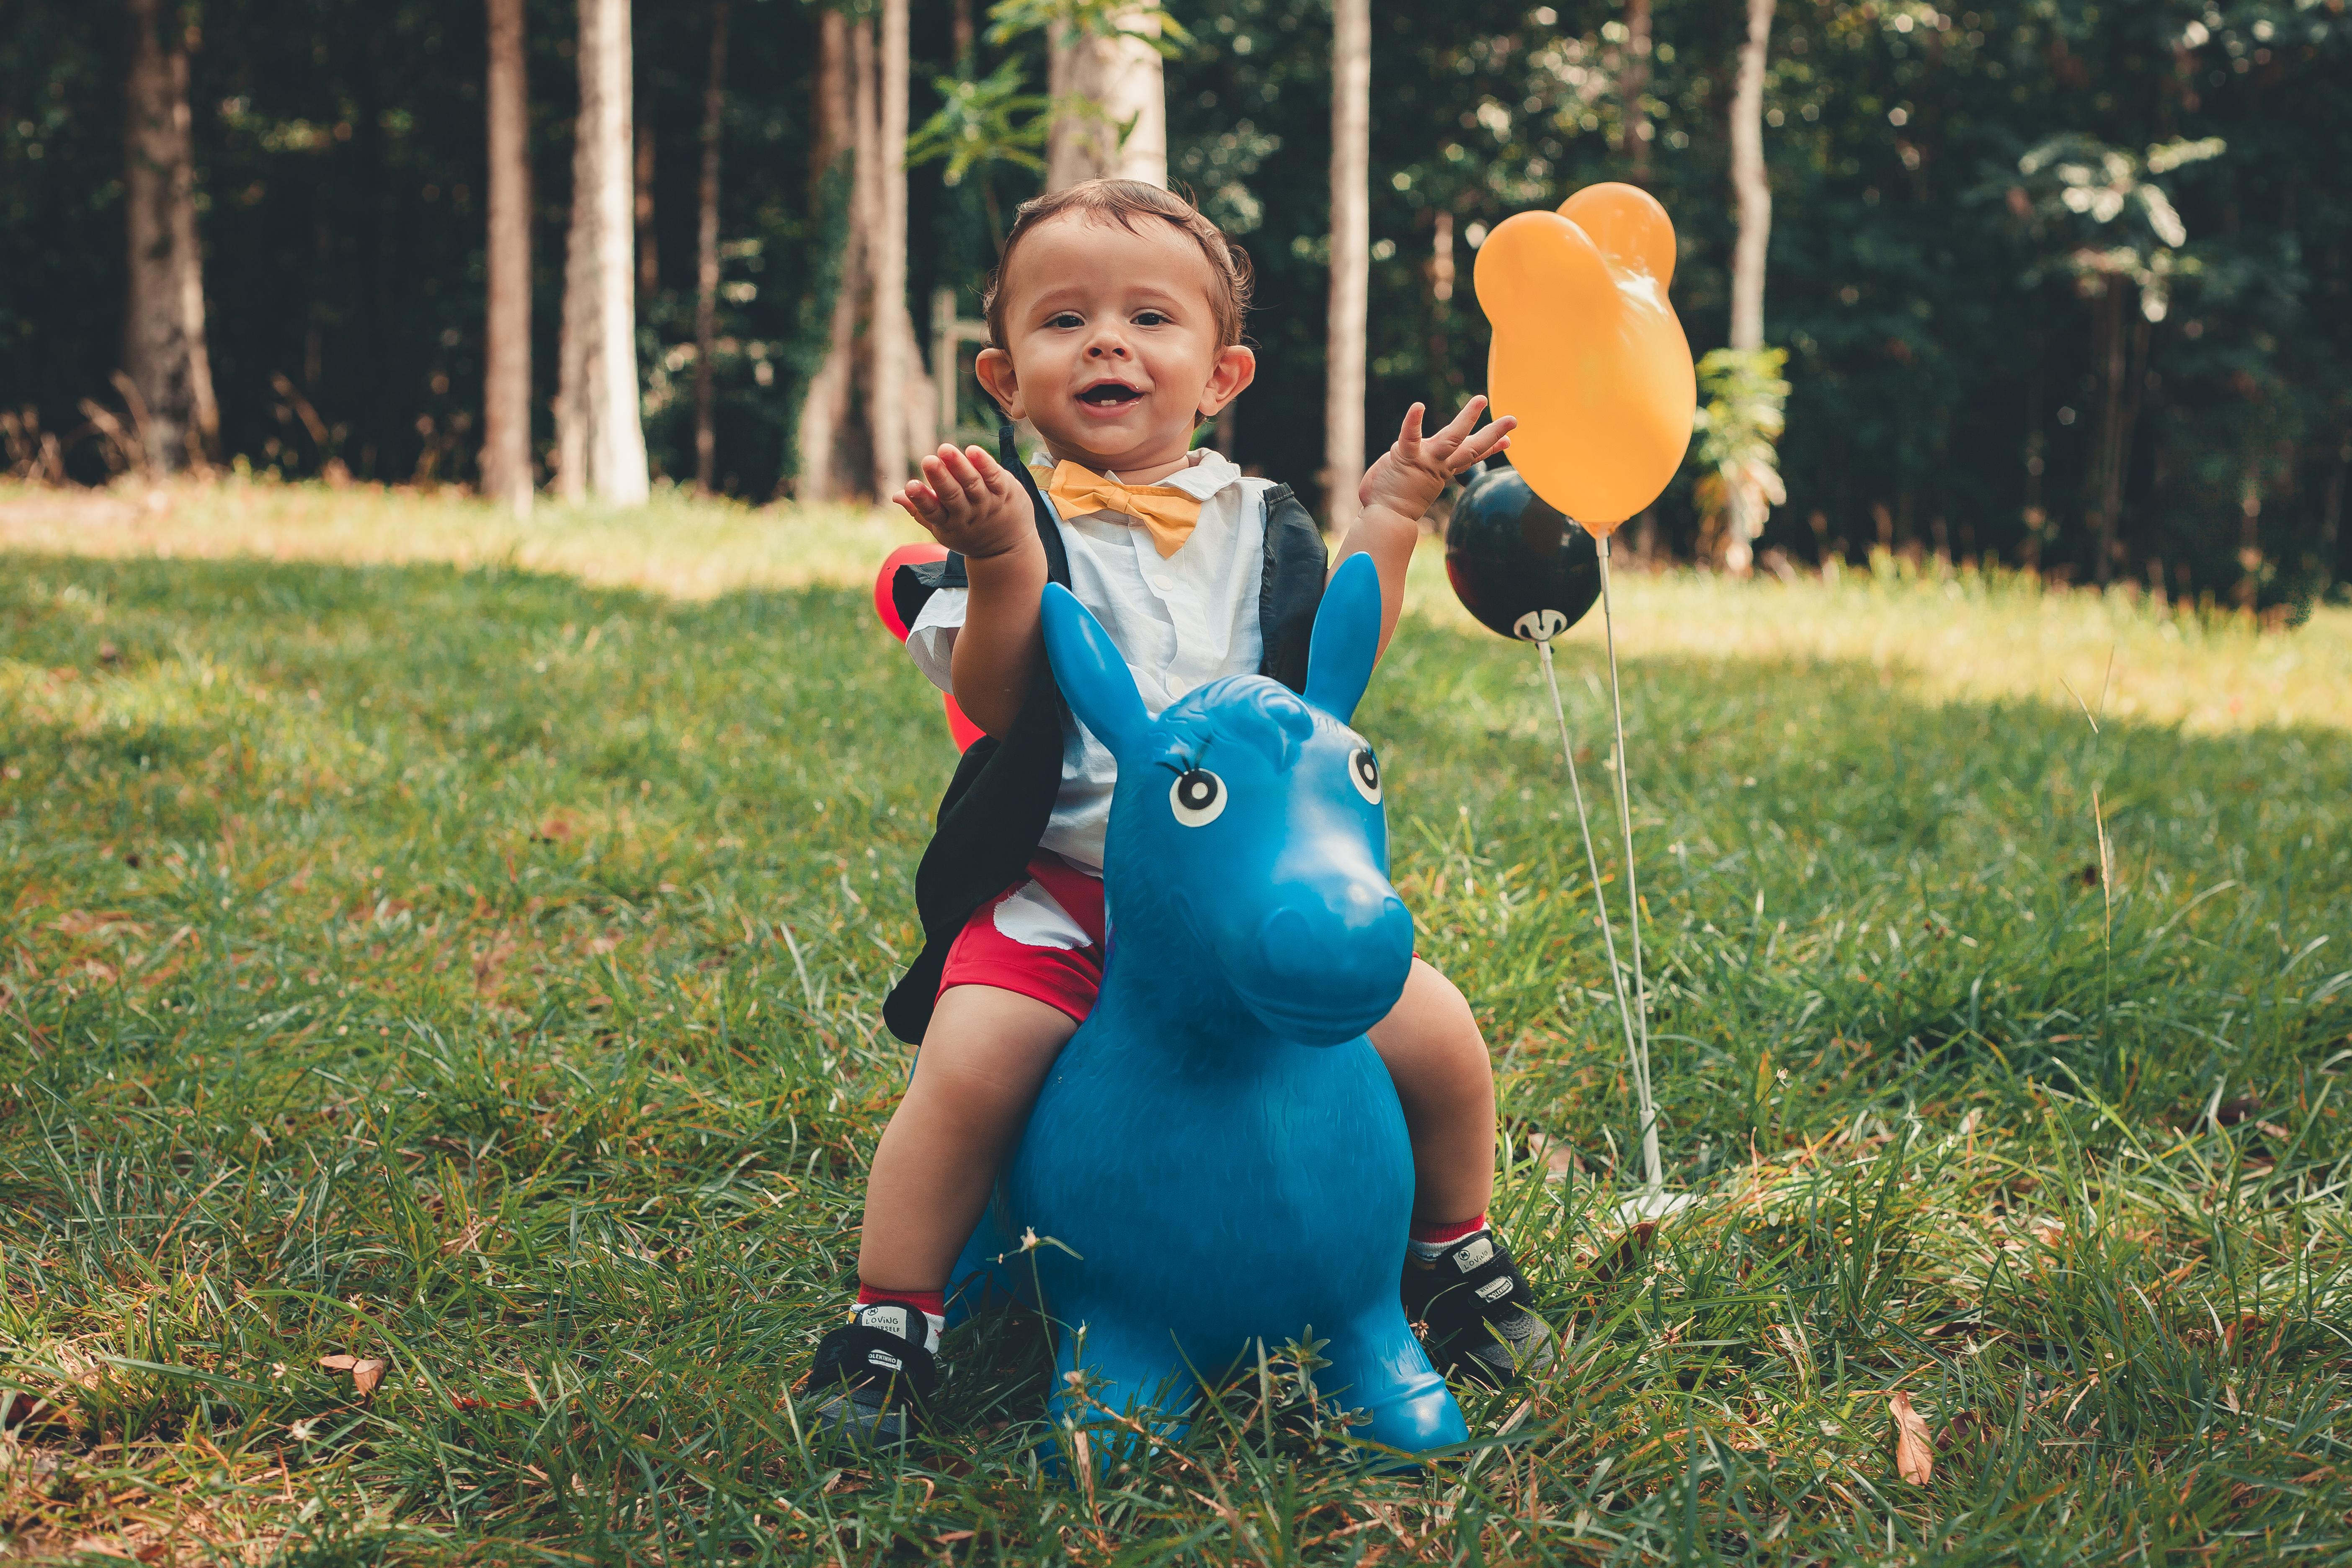 Little Boy Riding Blue Pony Toy Ride